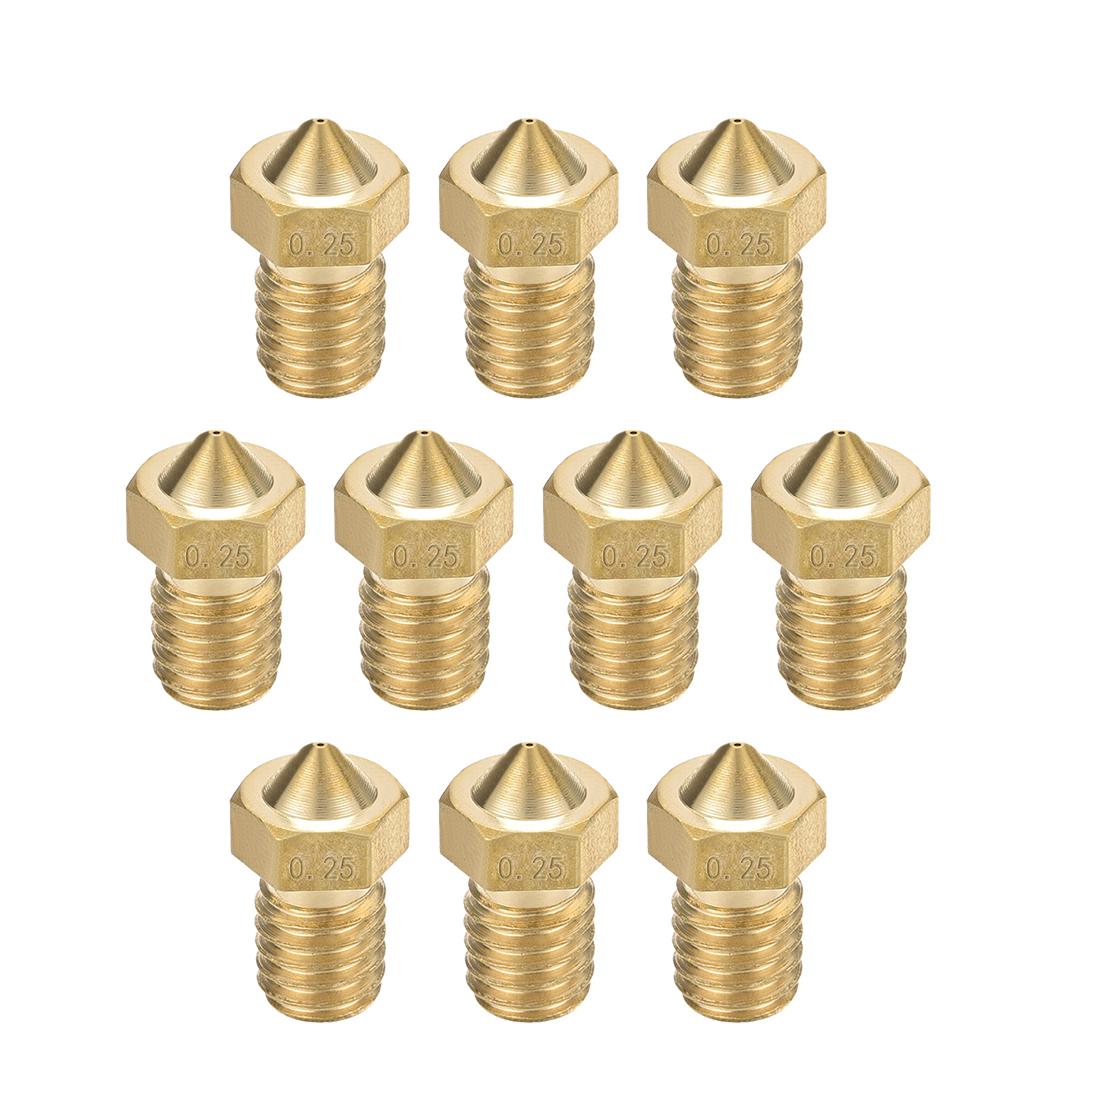 0.25mm 3D Printer Nozzle, Fit for V6, for 1.75mm Filament Brass 10pcs